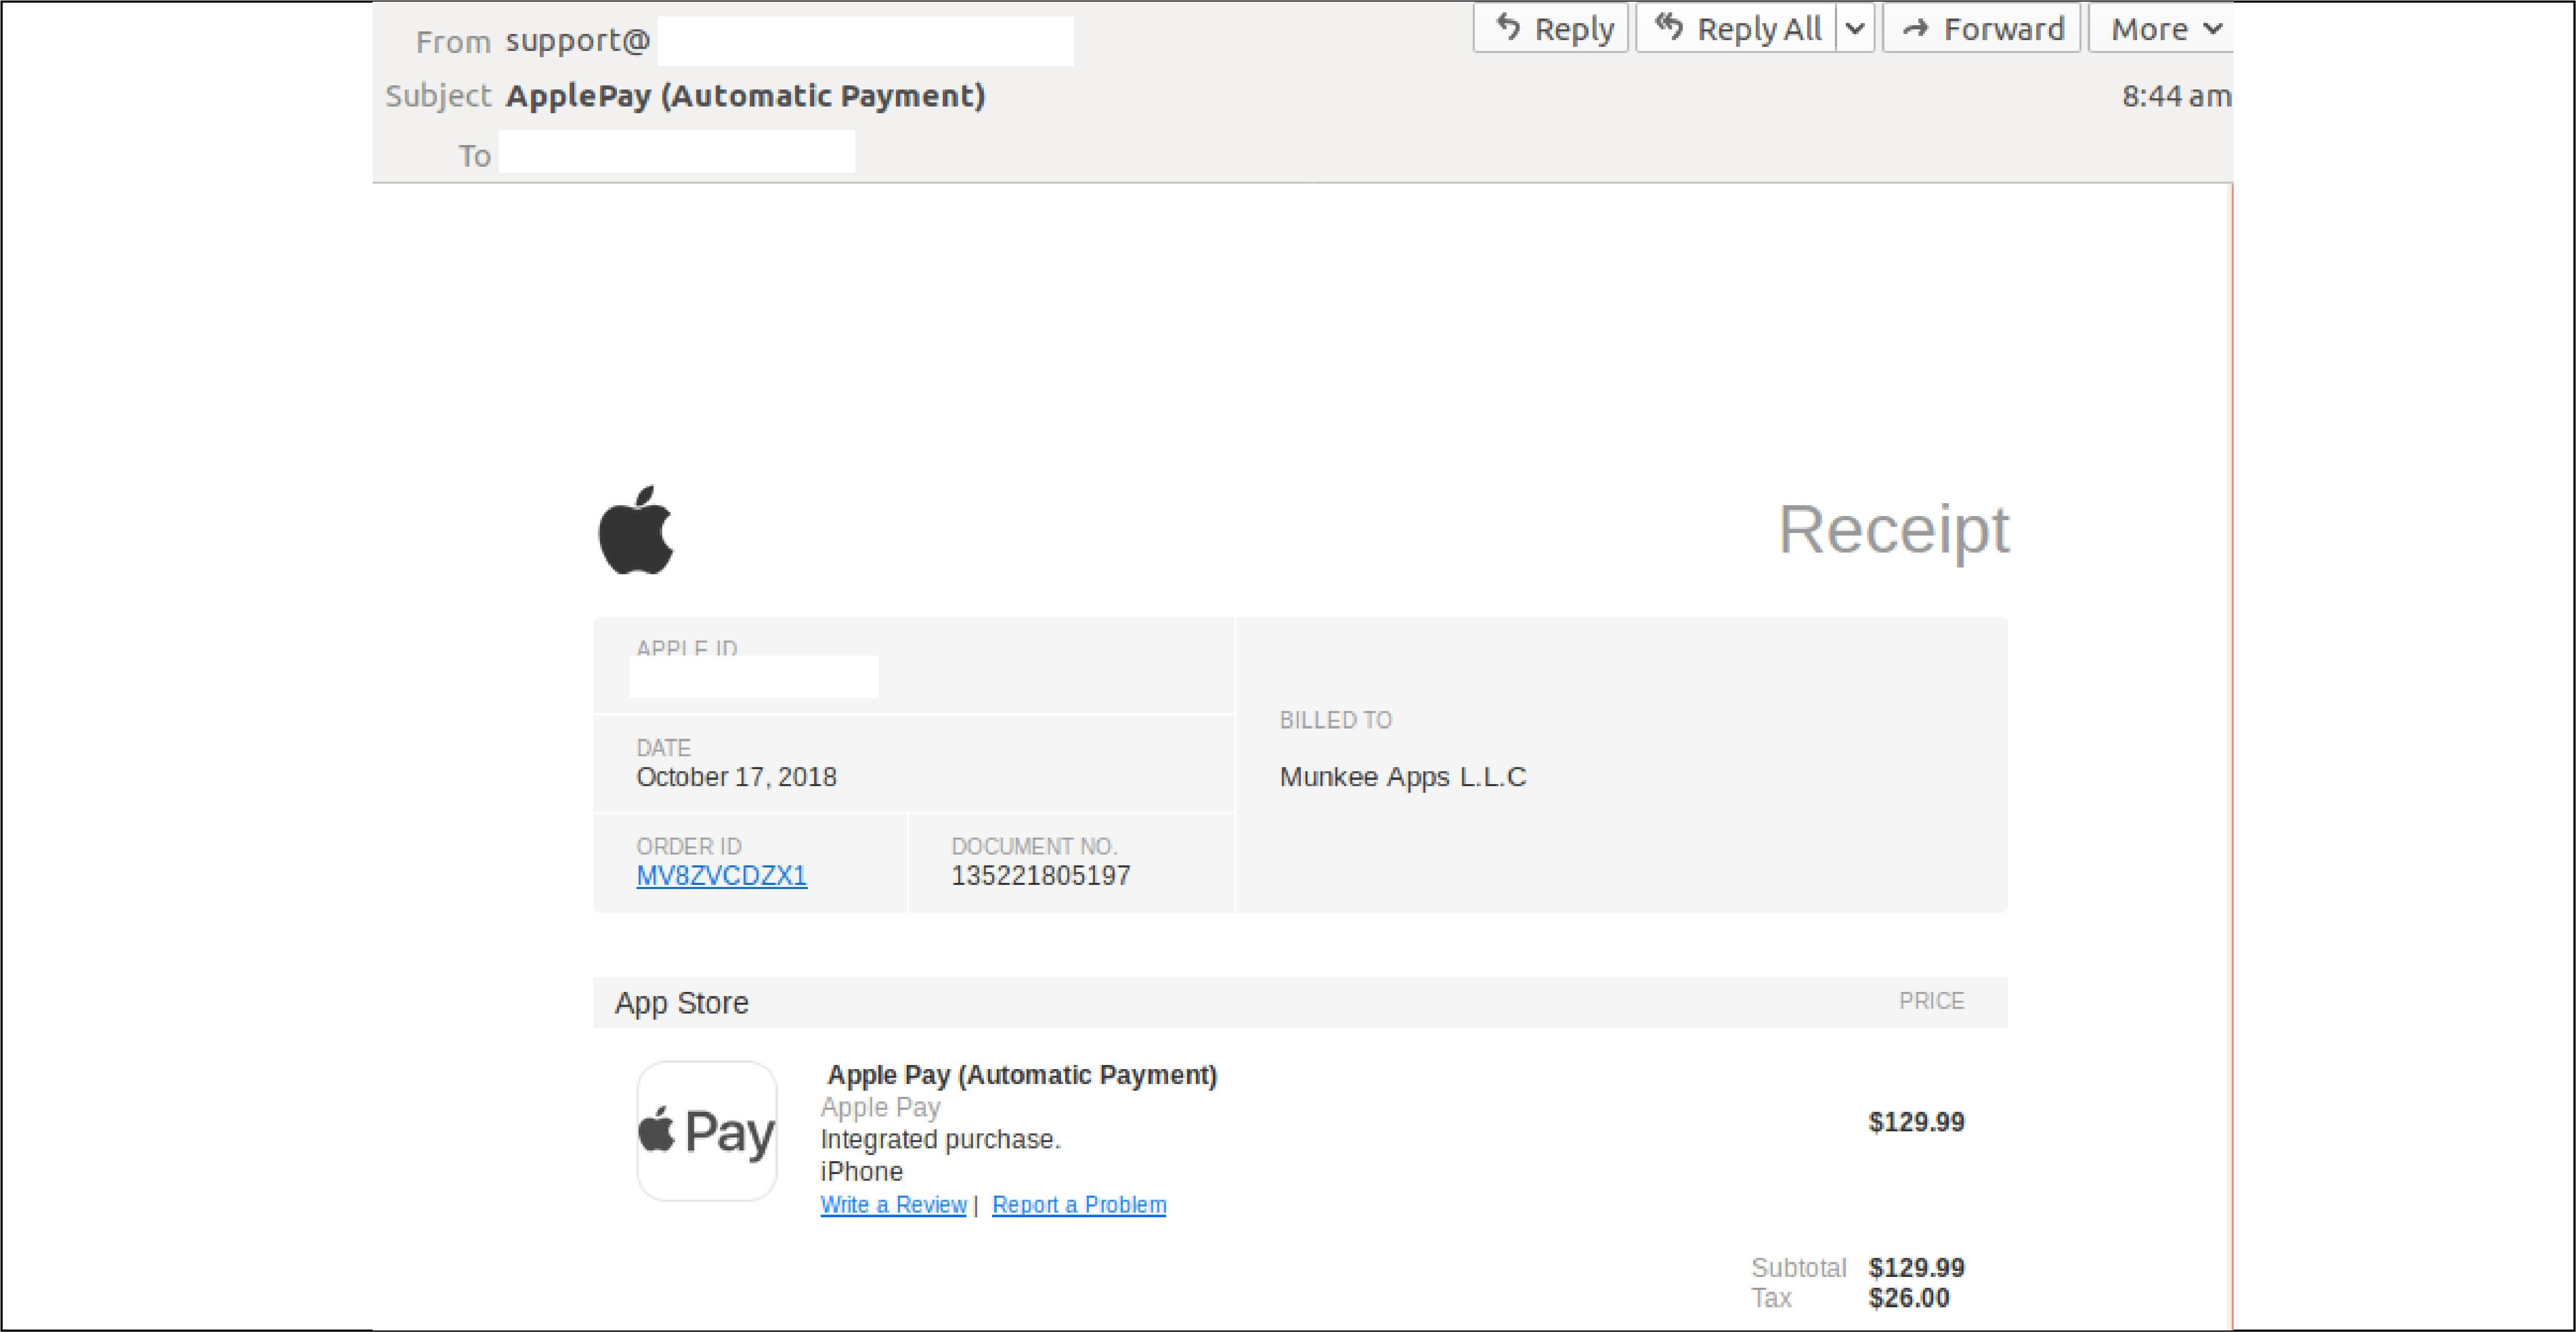 Apple pay social image 2